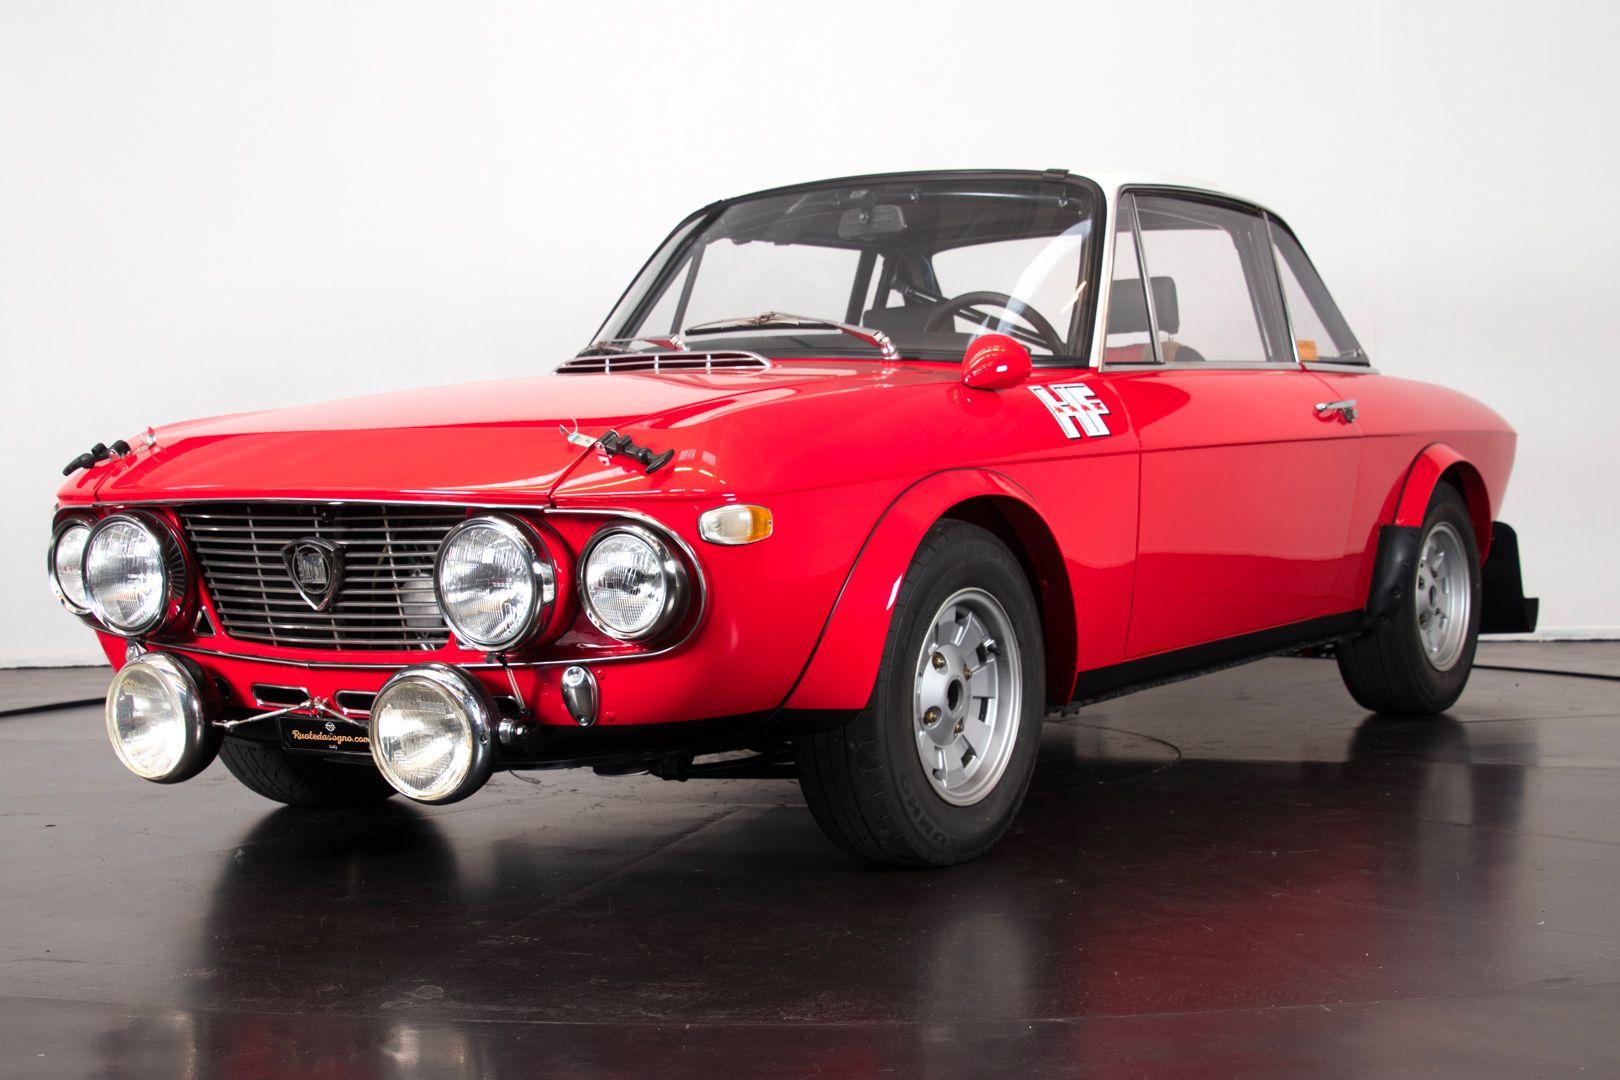 1970 Lancia Fulvia HF 1.6 - Gruppo 4 18804